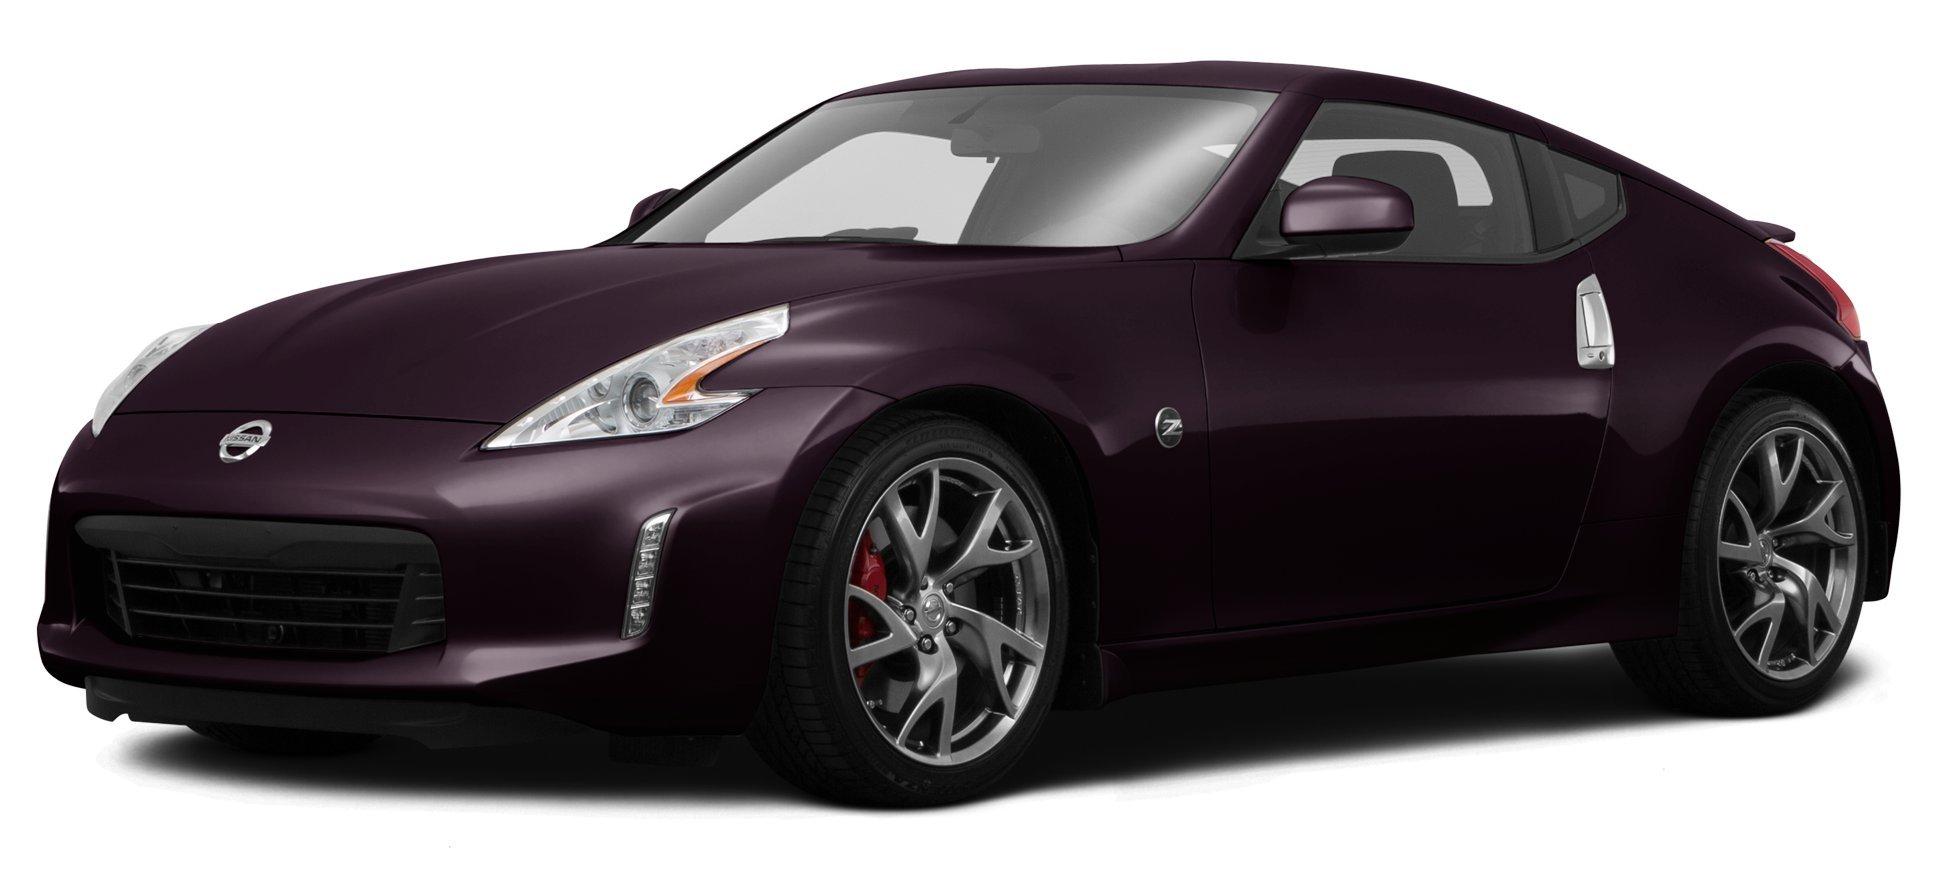 Amazon Com 2015 Nissan 370z Reviews Images And Specs Vehicles